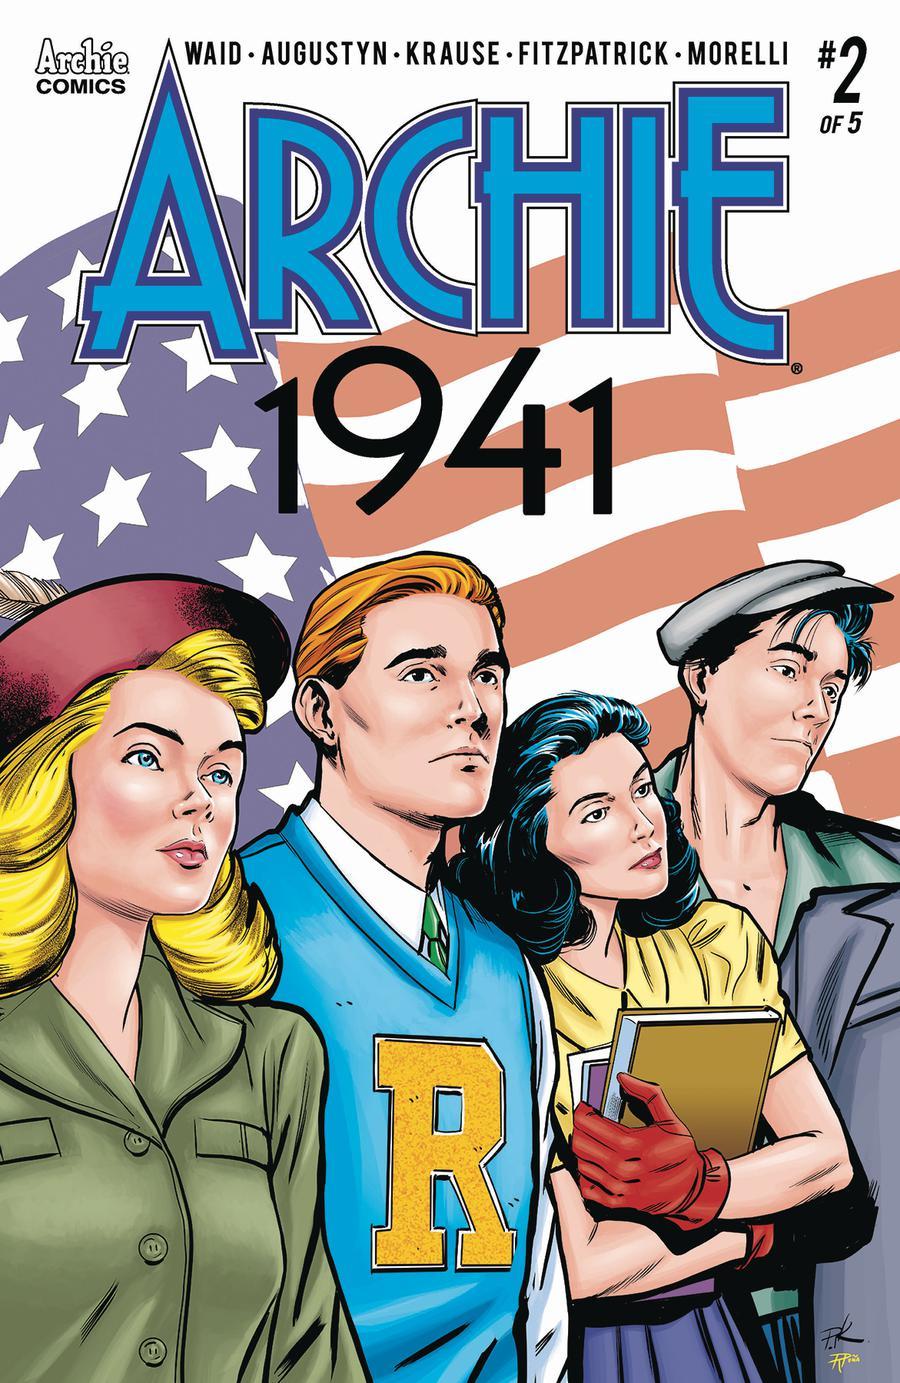 Archie 1941 #2 Cover A Regular Peter Krause & Rosario Tito Pena Cover